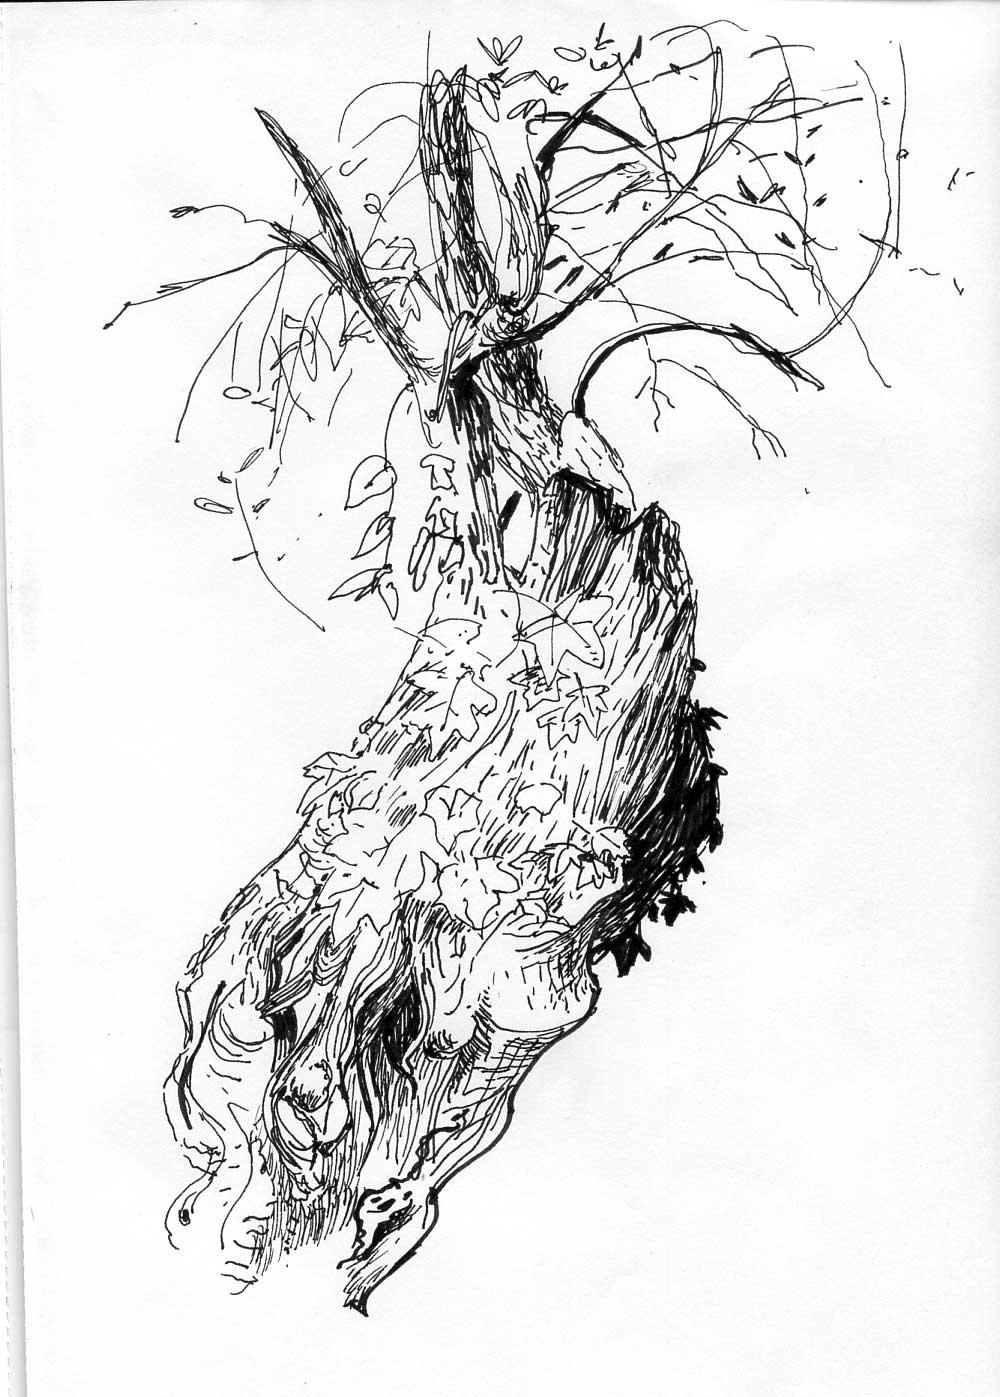 olivier028